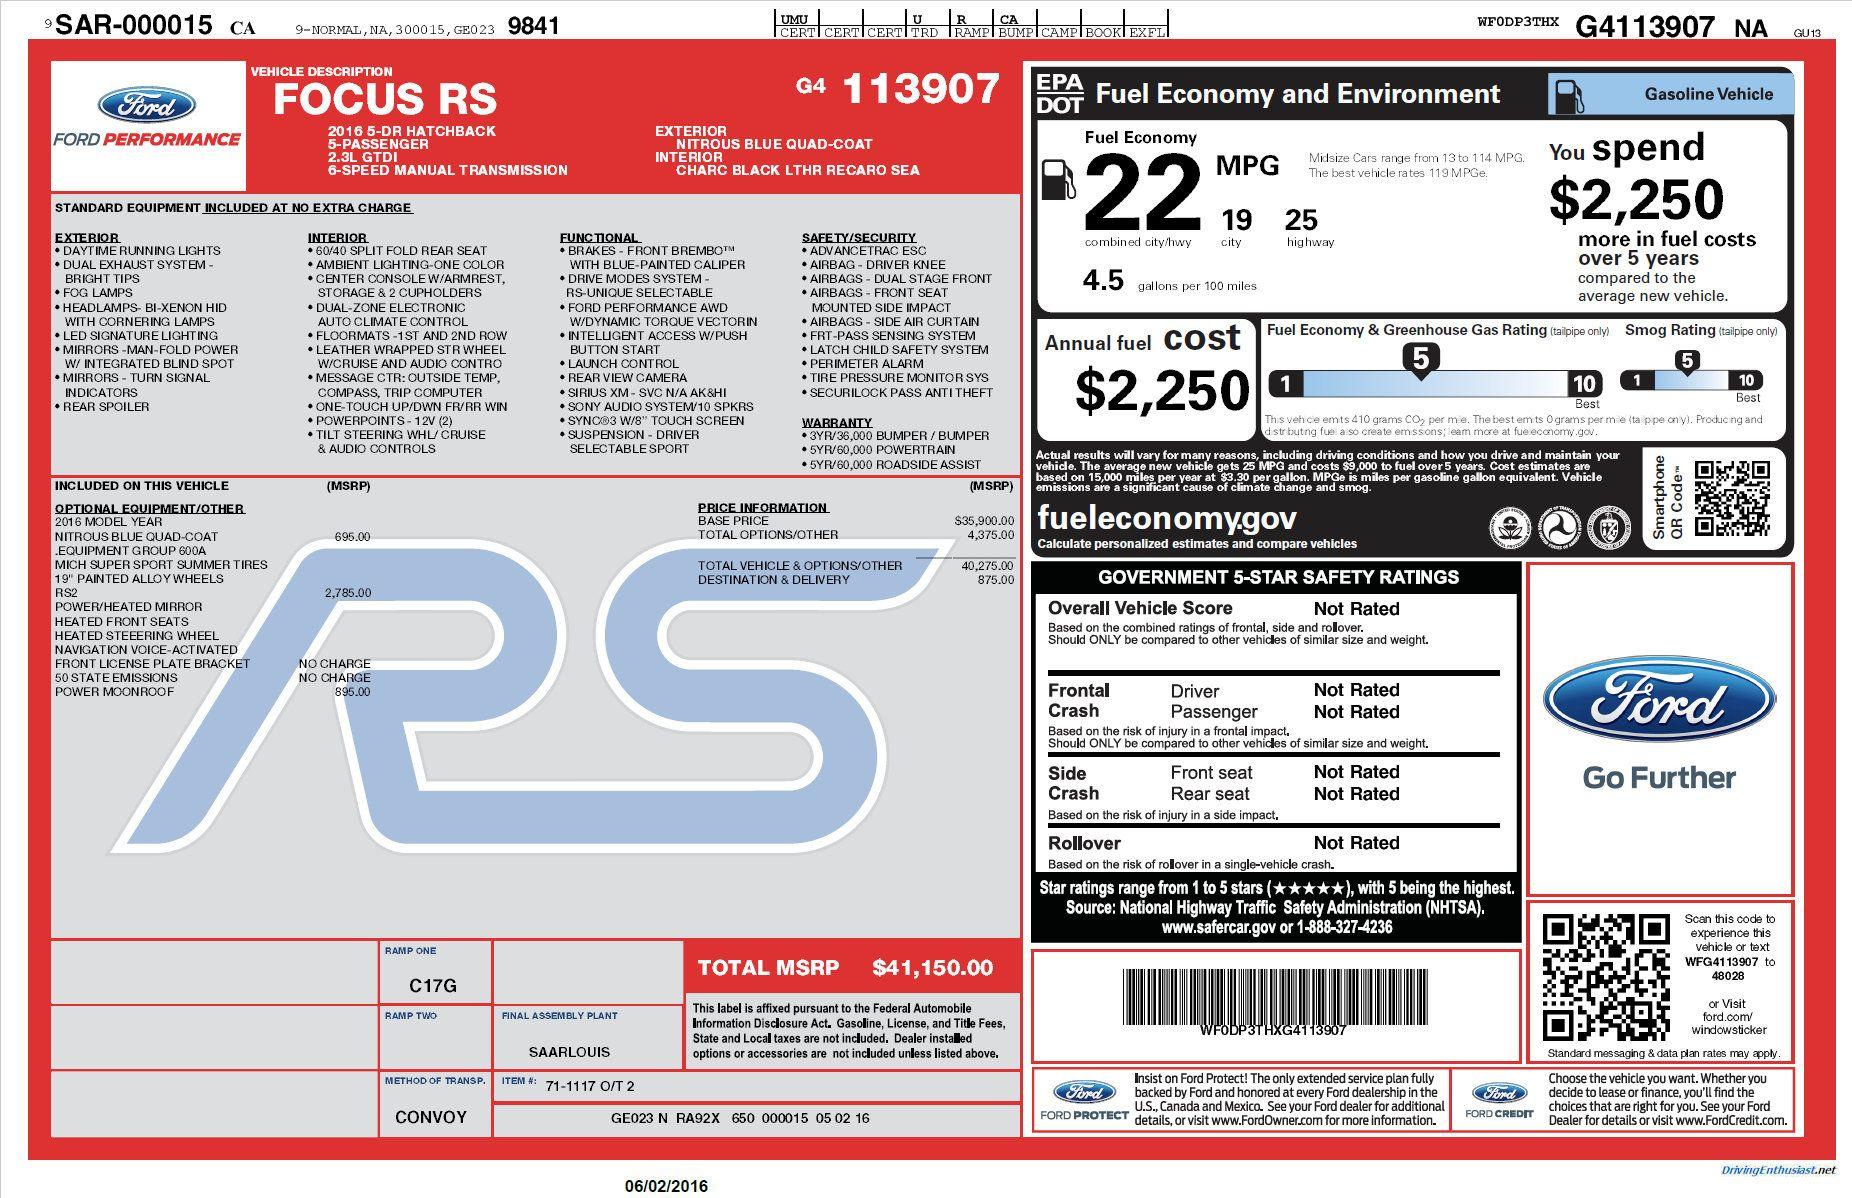 2016 Ford Focus Rs Window Sticker Nitrous Blue Quad Coat With Rs2 Ford Focus Rs Focus Rs Fuel Cost